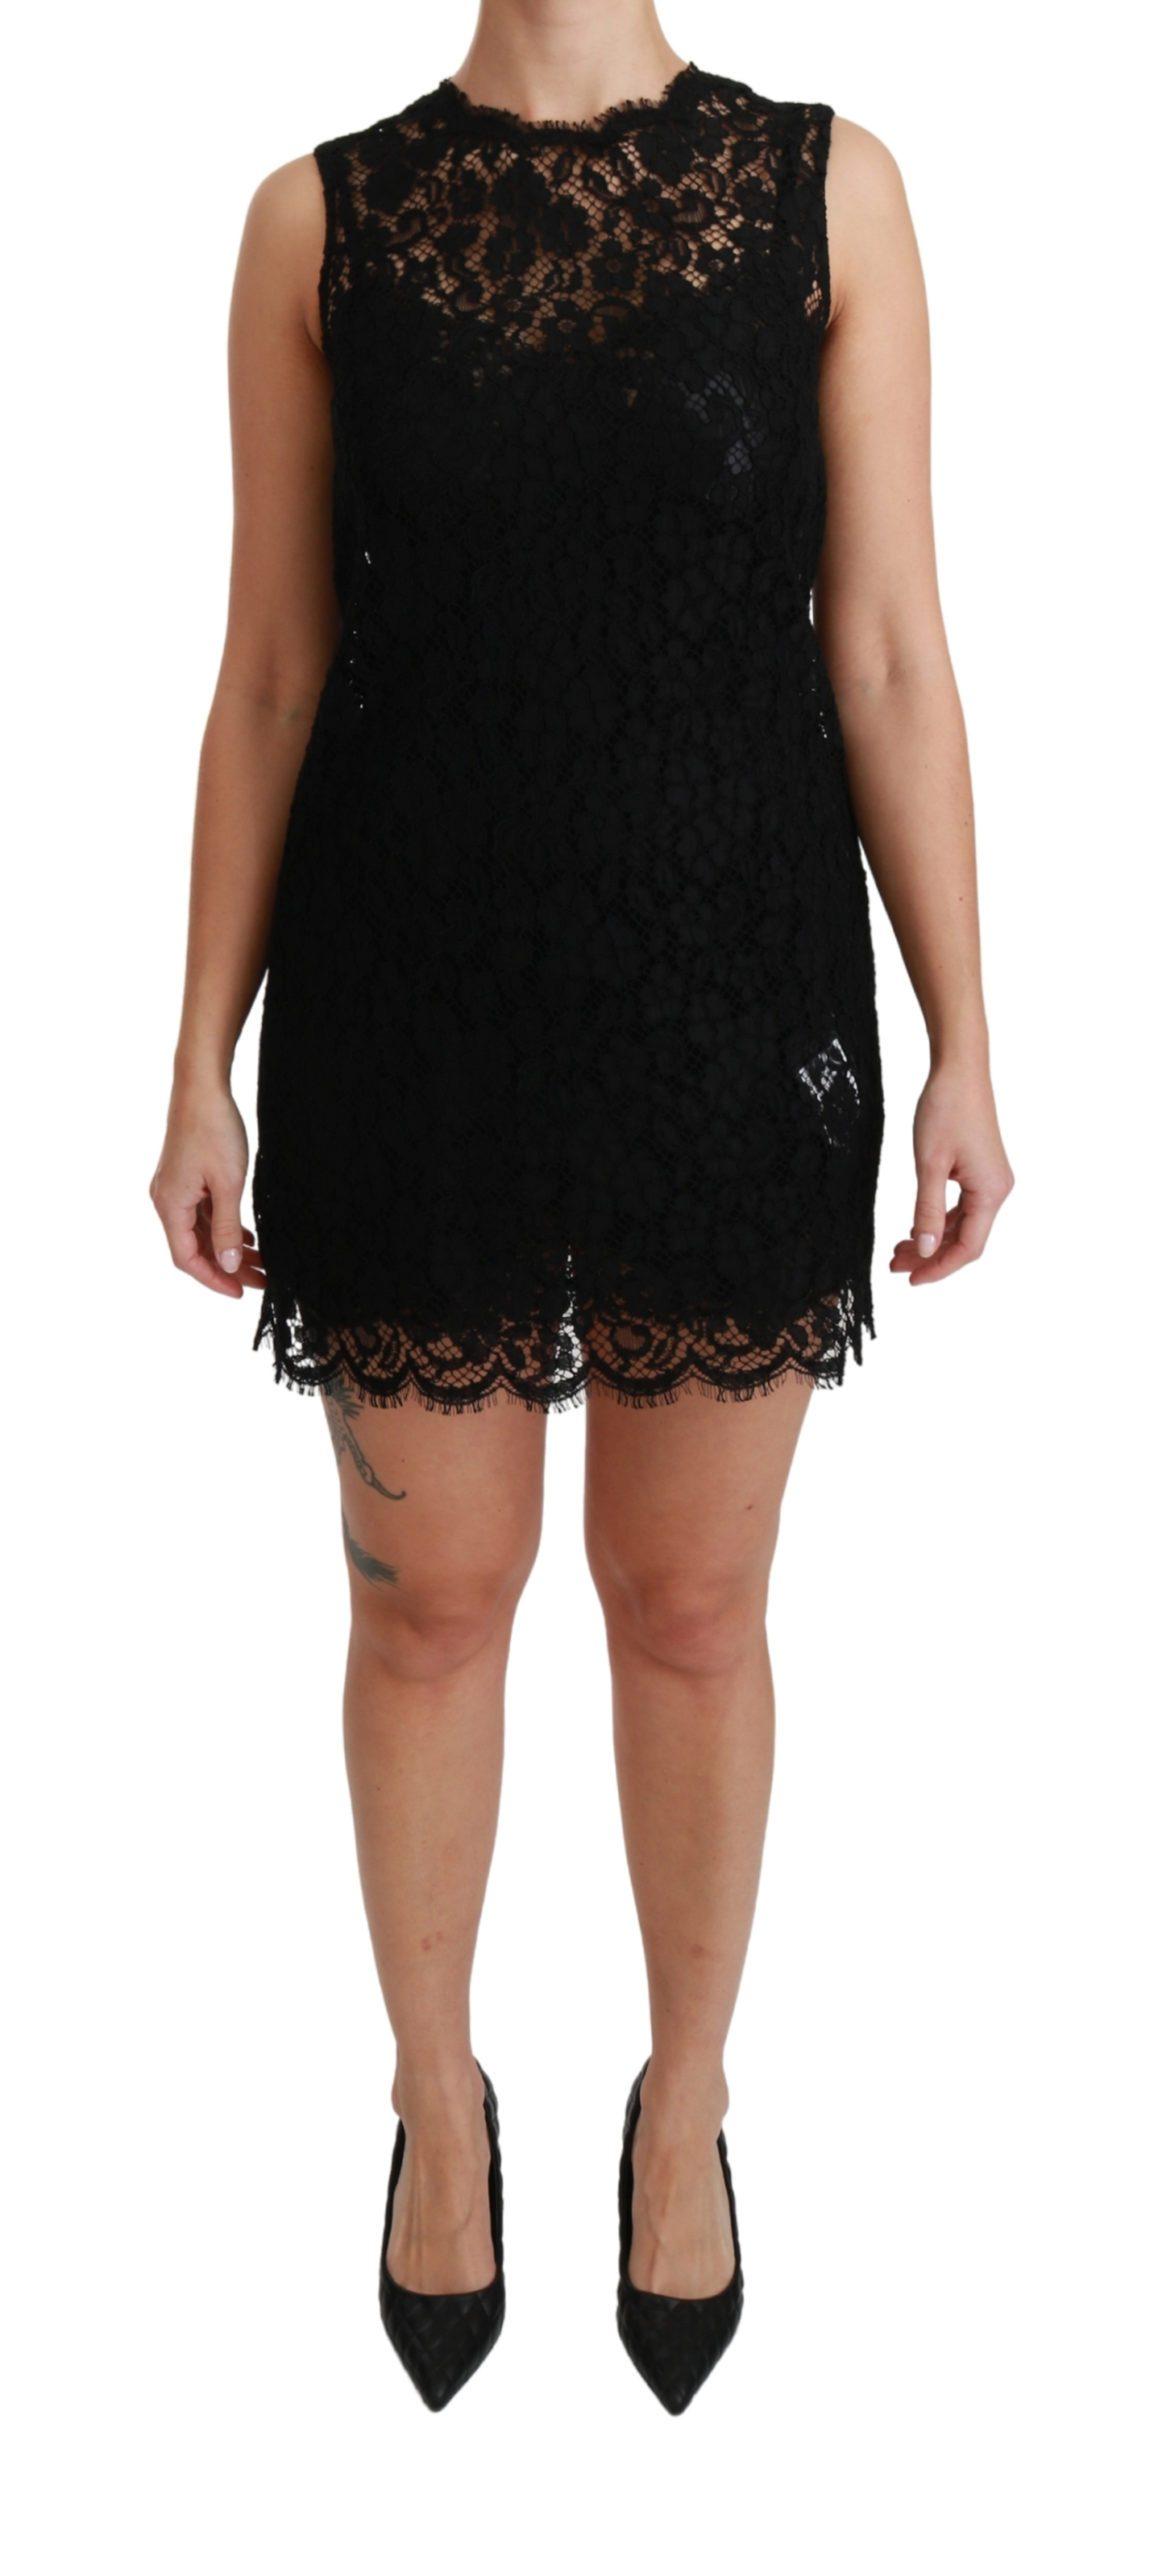 Dolce & Gabbana Women's Sleeveless Lace Cotton Mini Dress Black DR2505 - IT38 XS